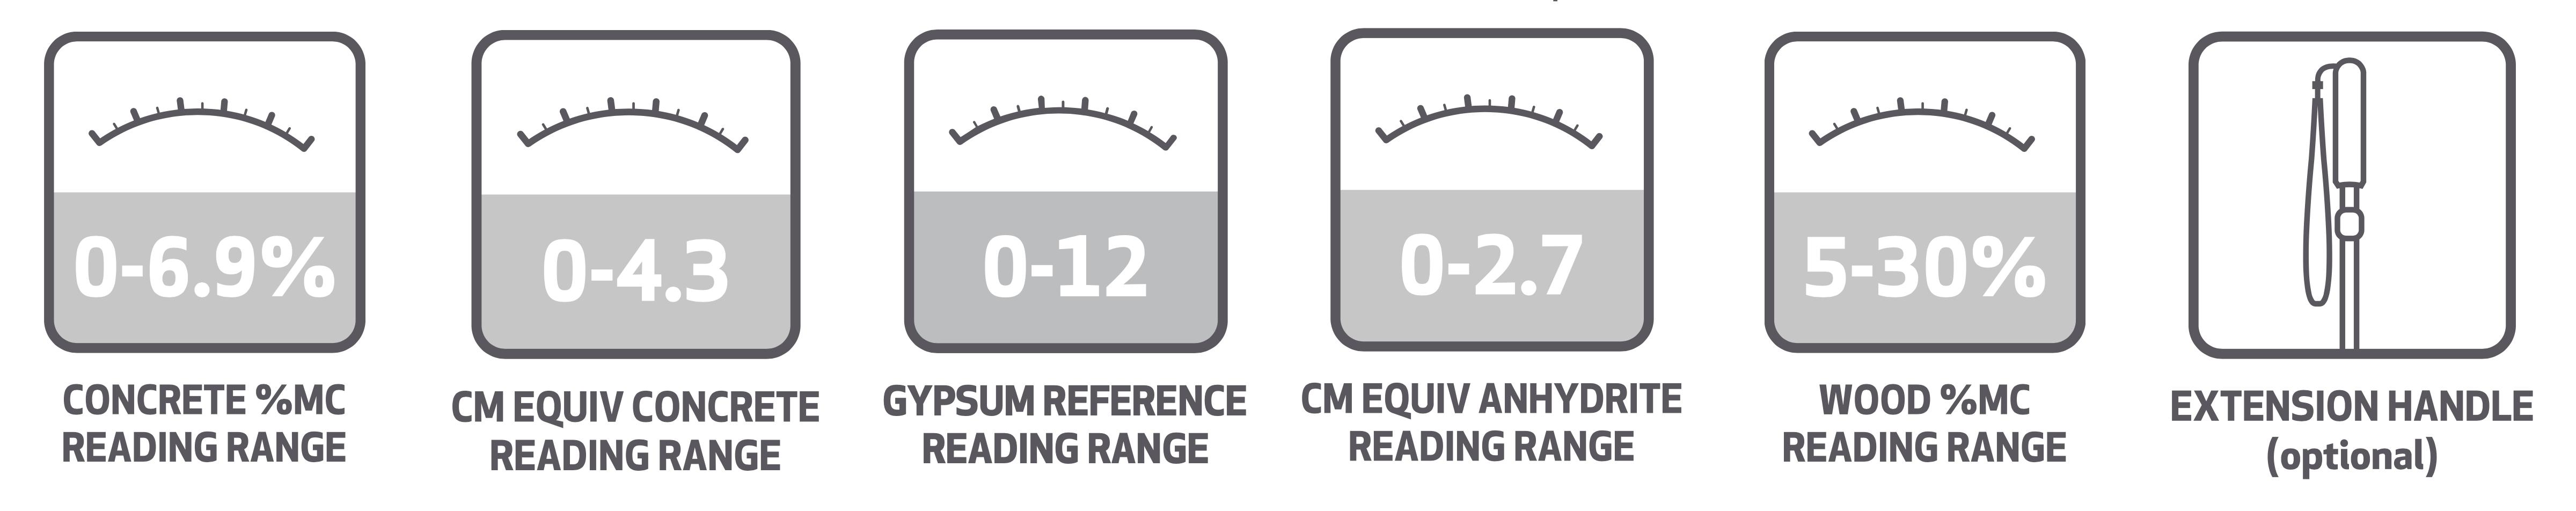 Tramex CMEX5 Measurements